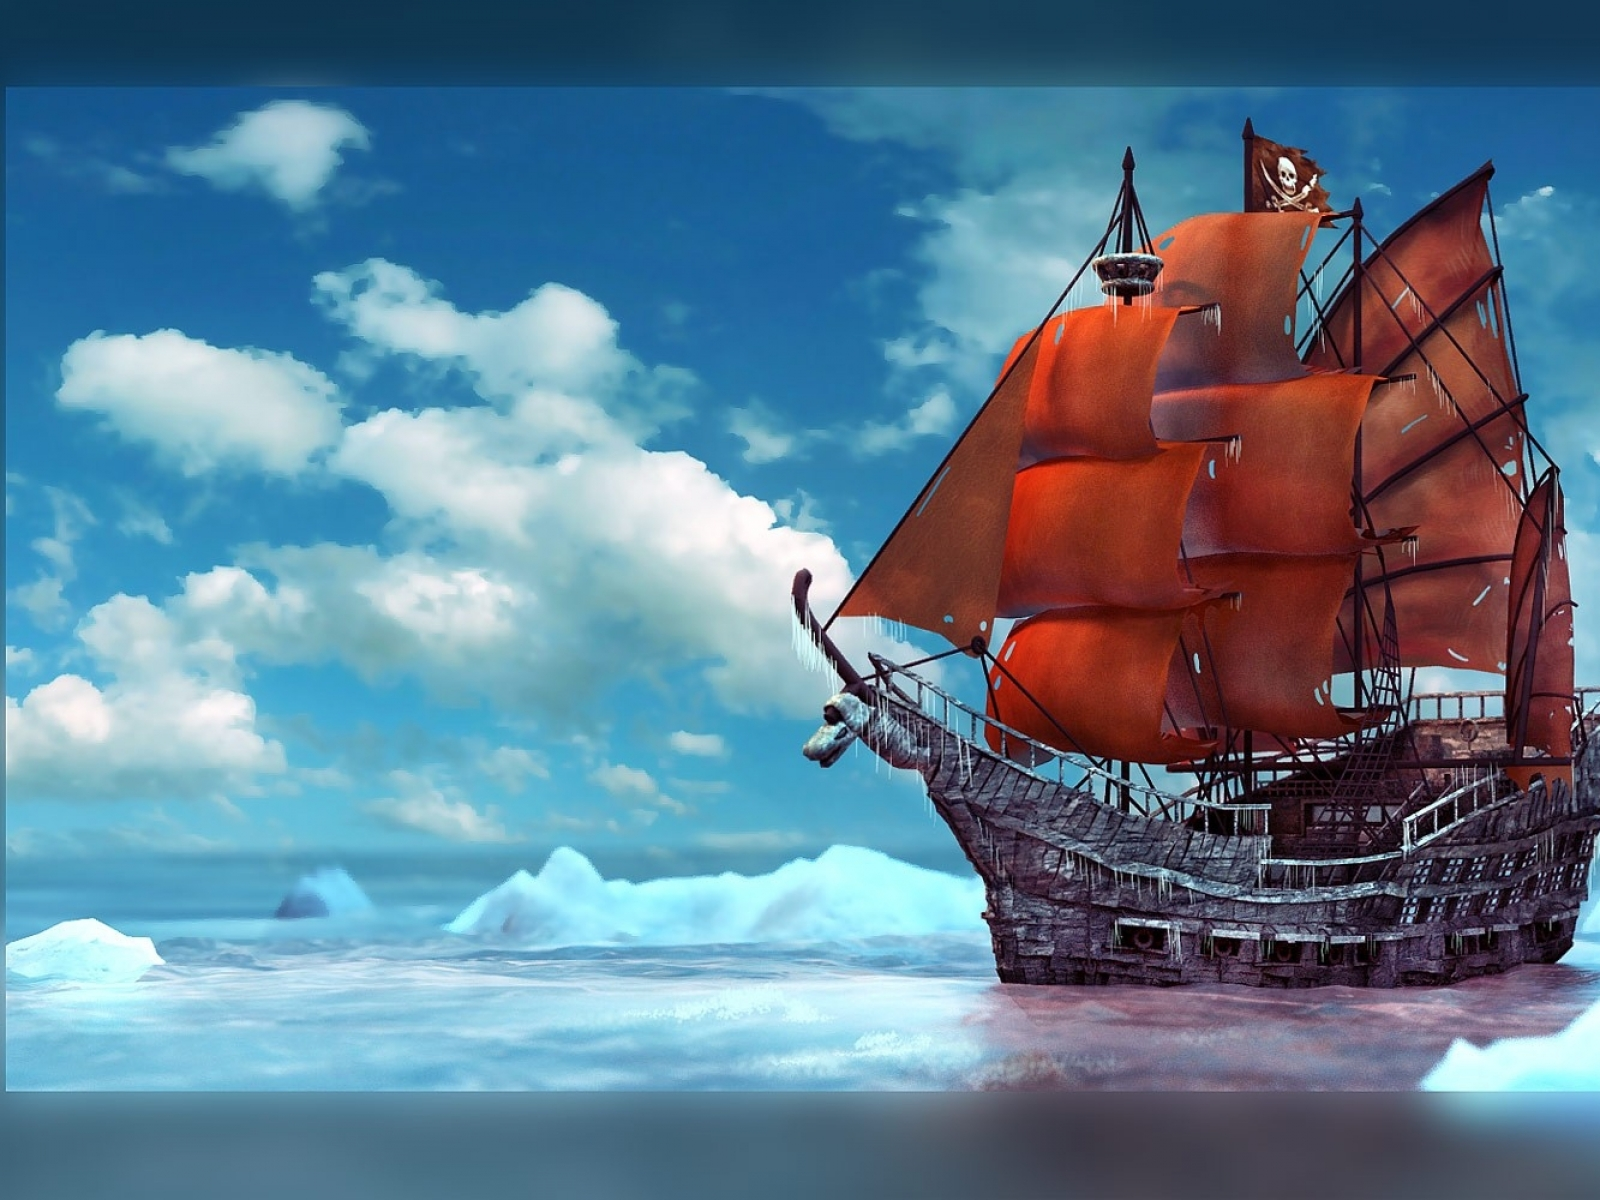 Pirate ship 1600x1200